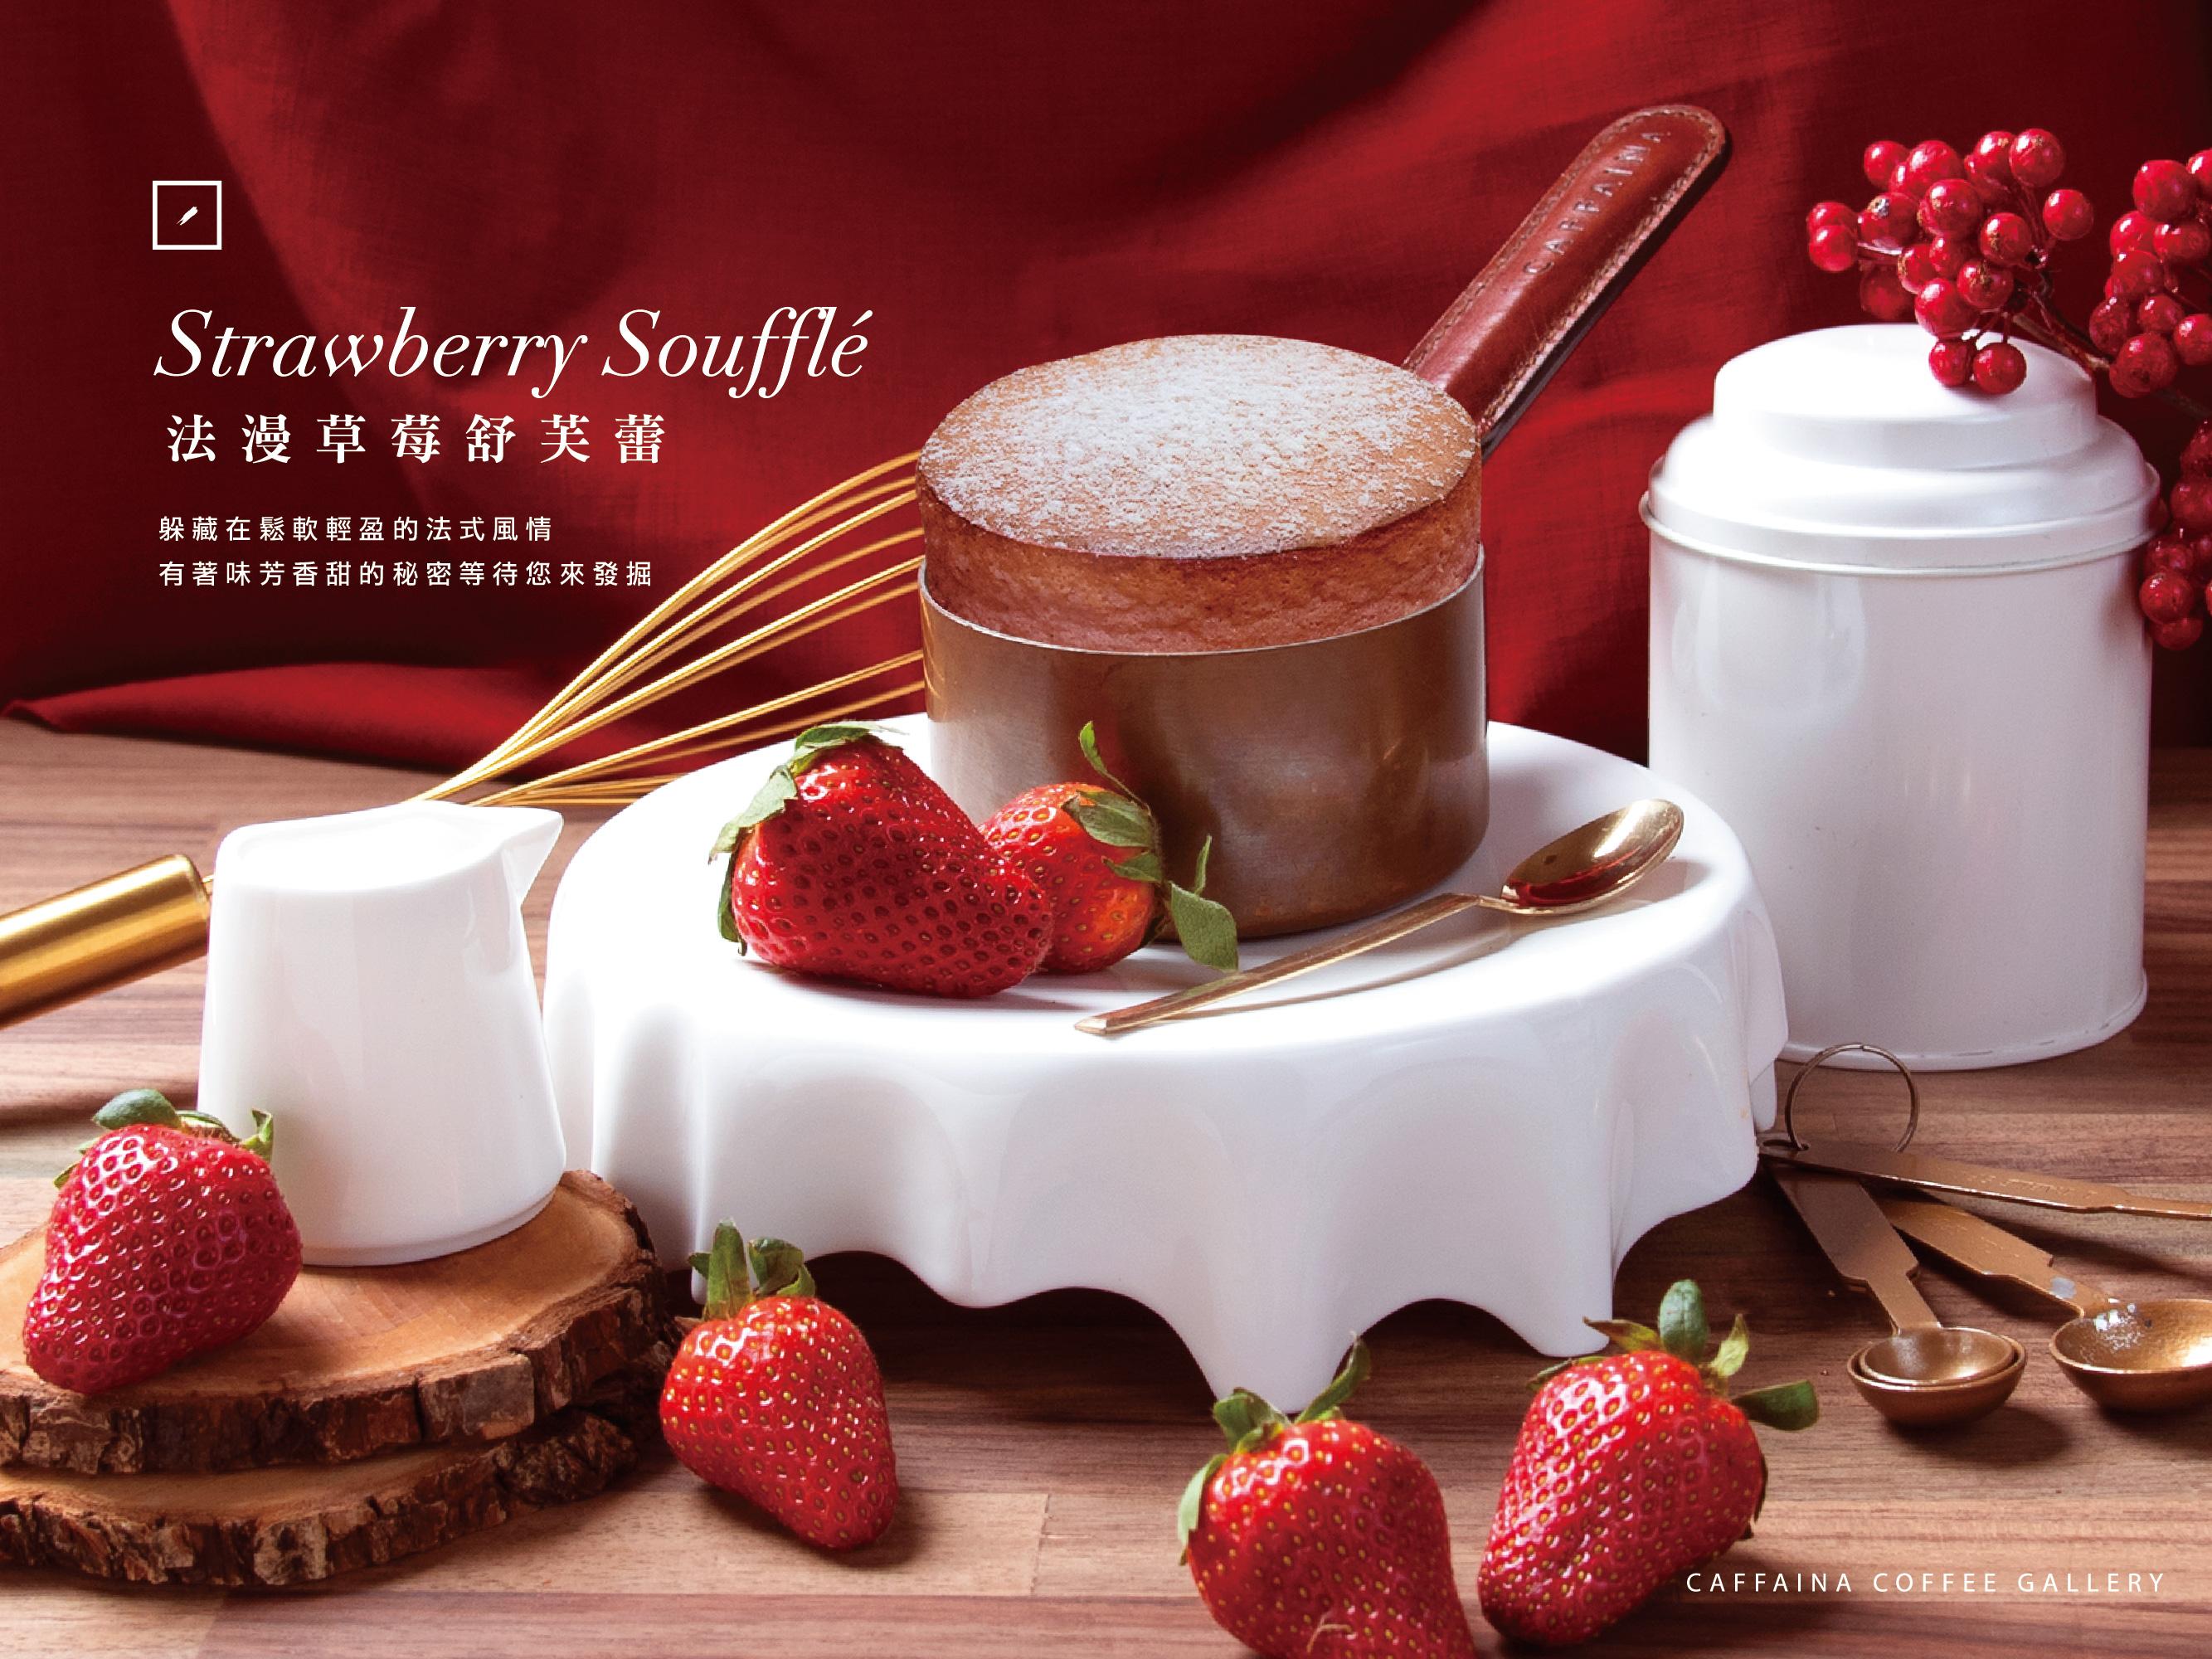 January✨New Arrival |卡啡那草莓季新品上市|